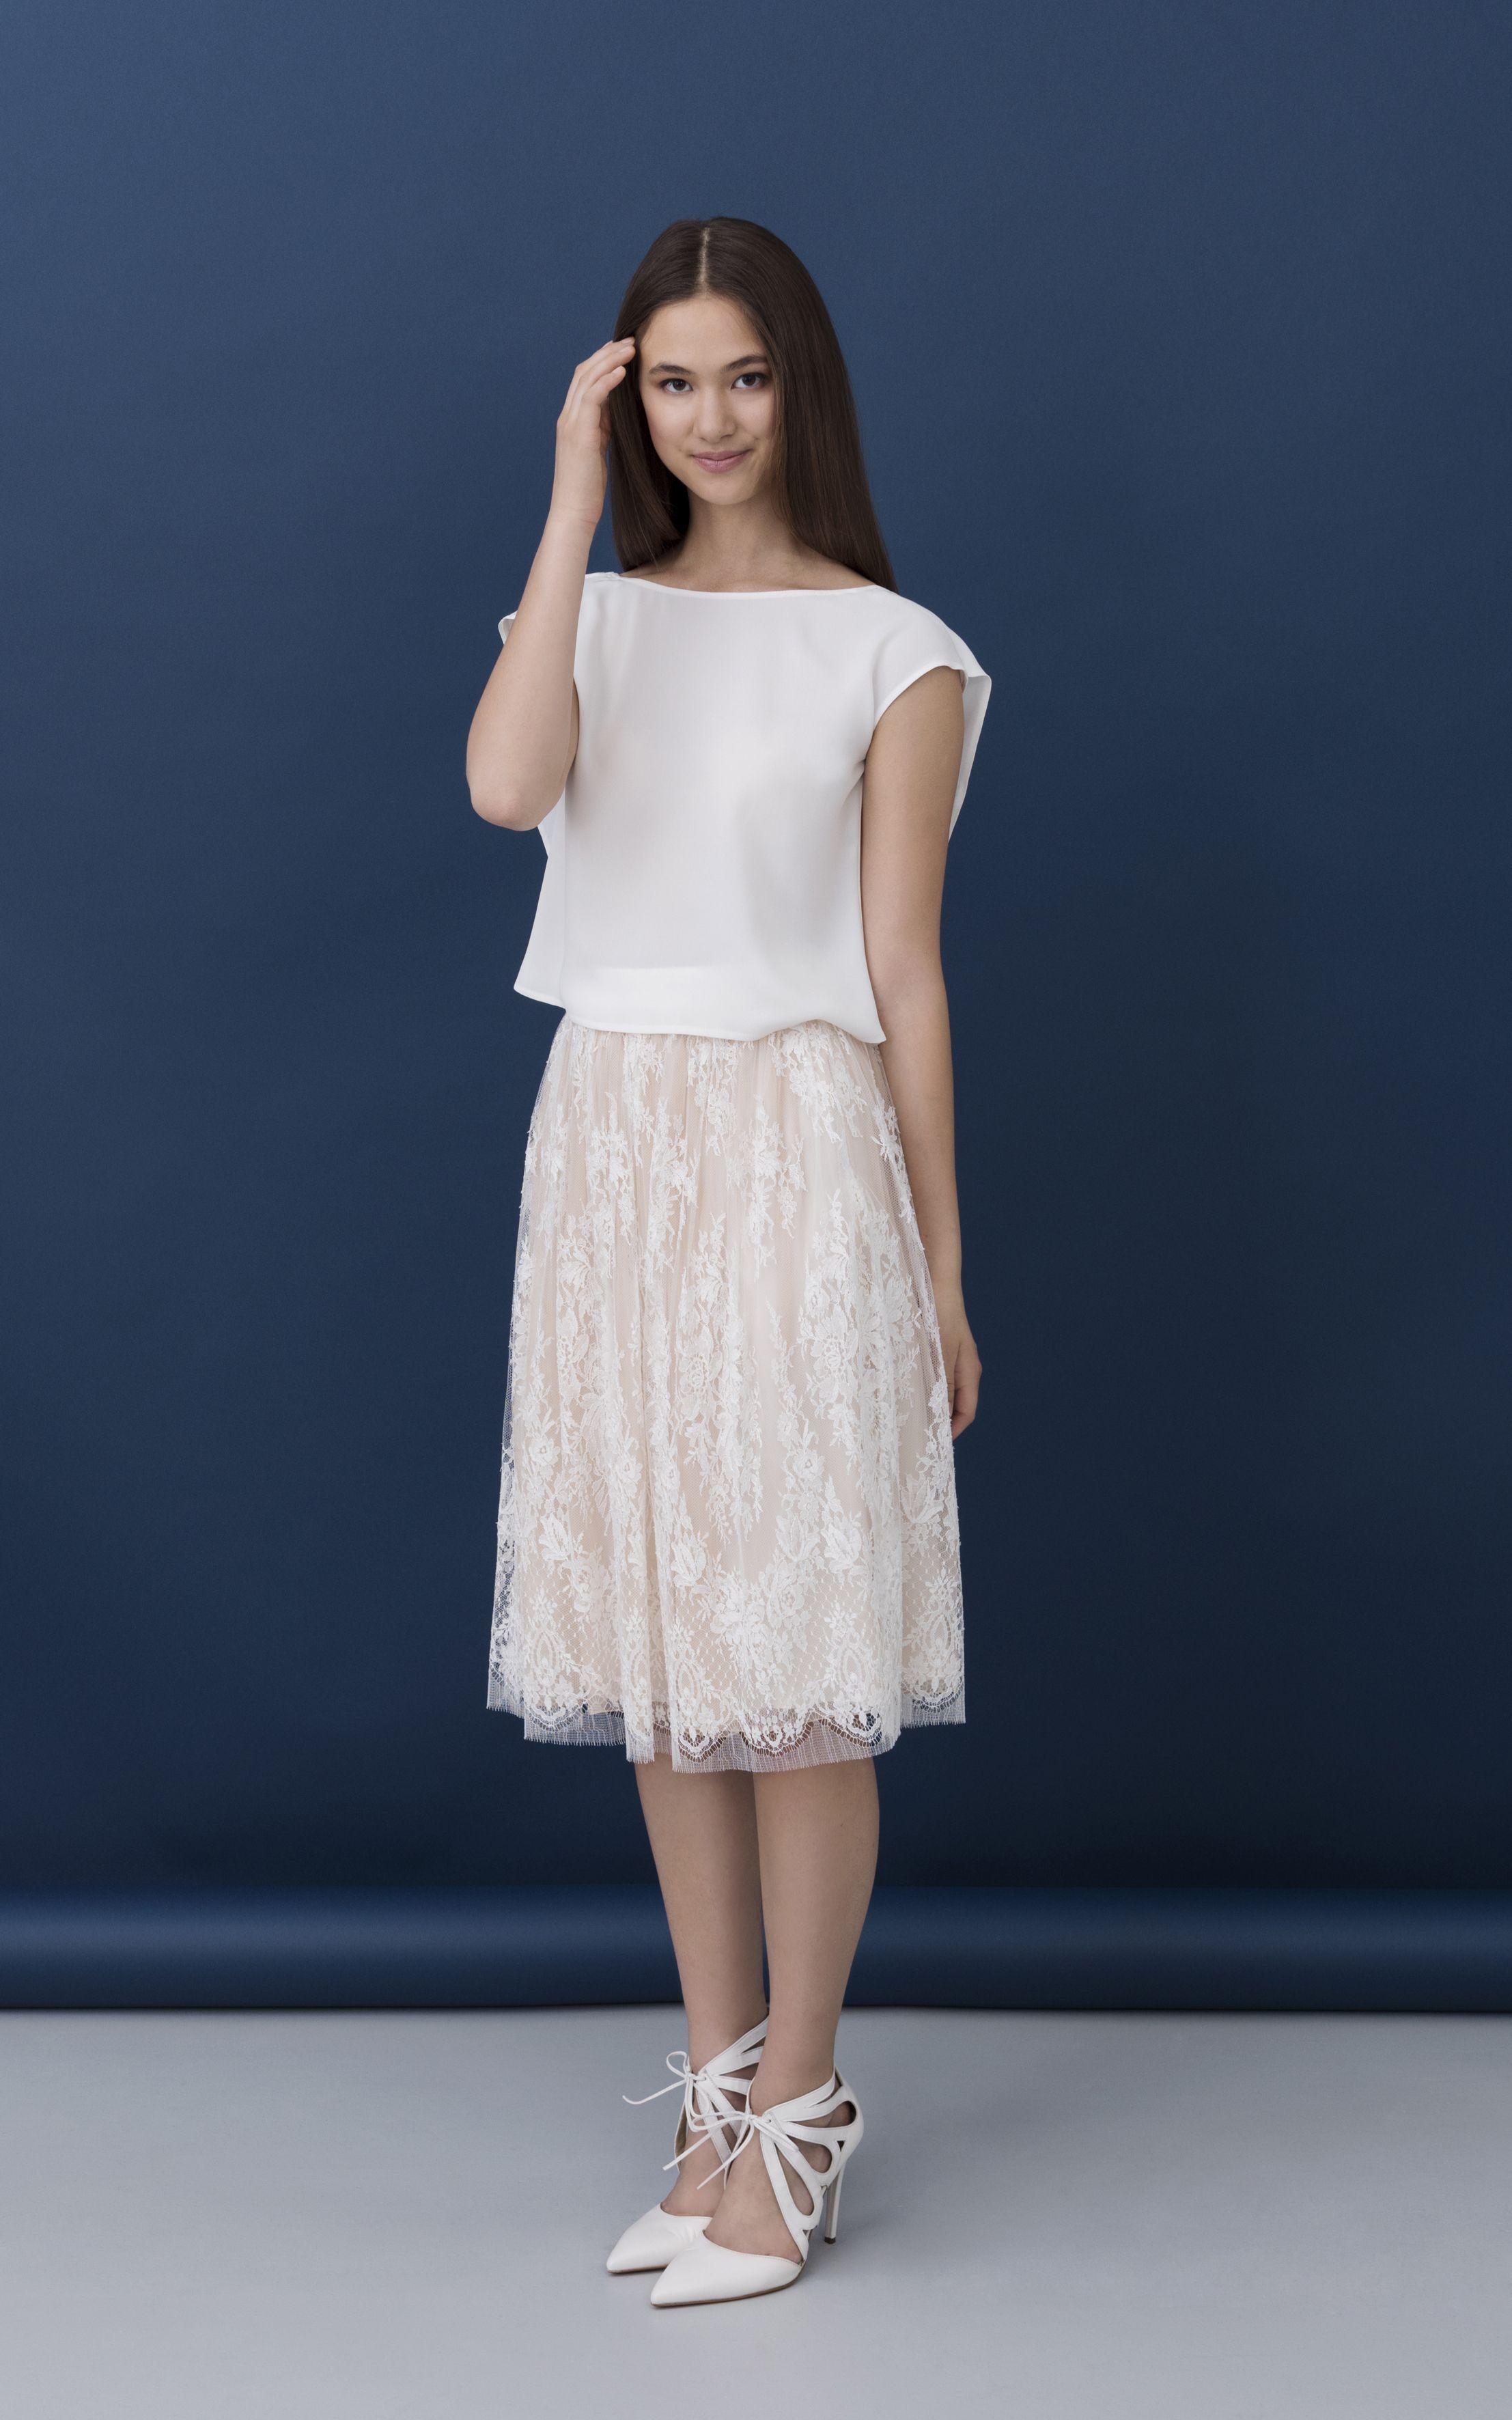 kisui Berlin Collection Bridal Style: Skirt lina & Top lya ...